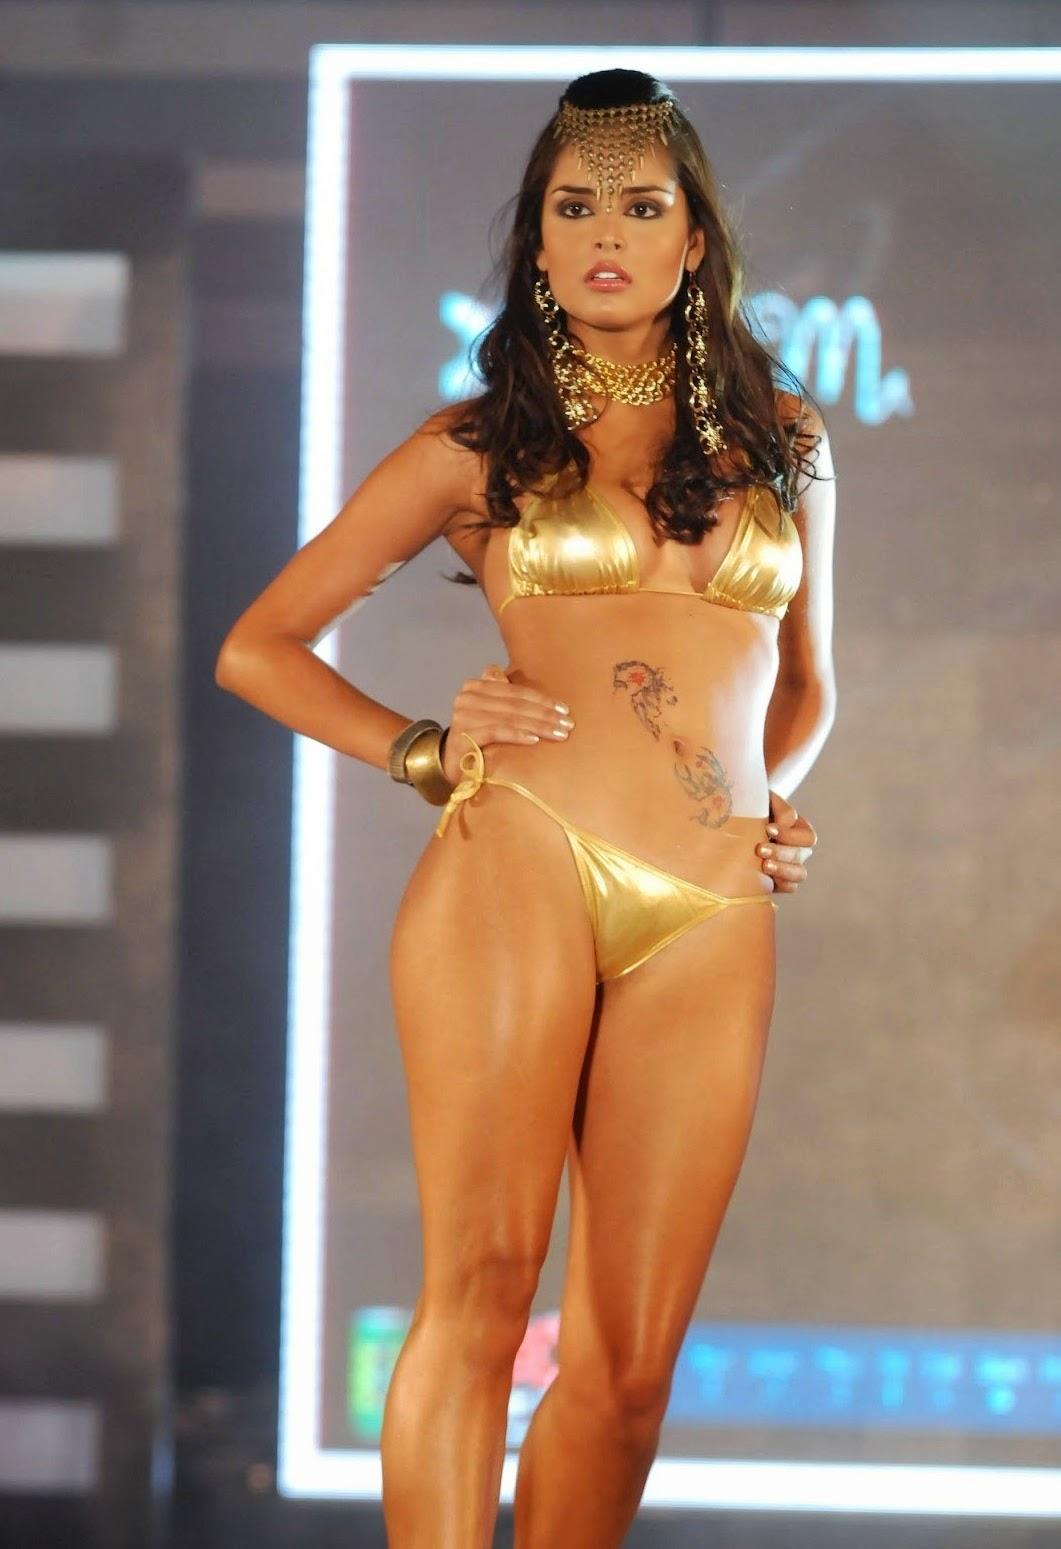 Sri lankan models ass naked - New porno